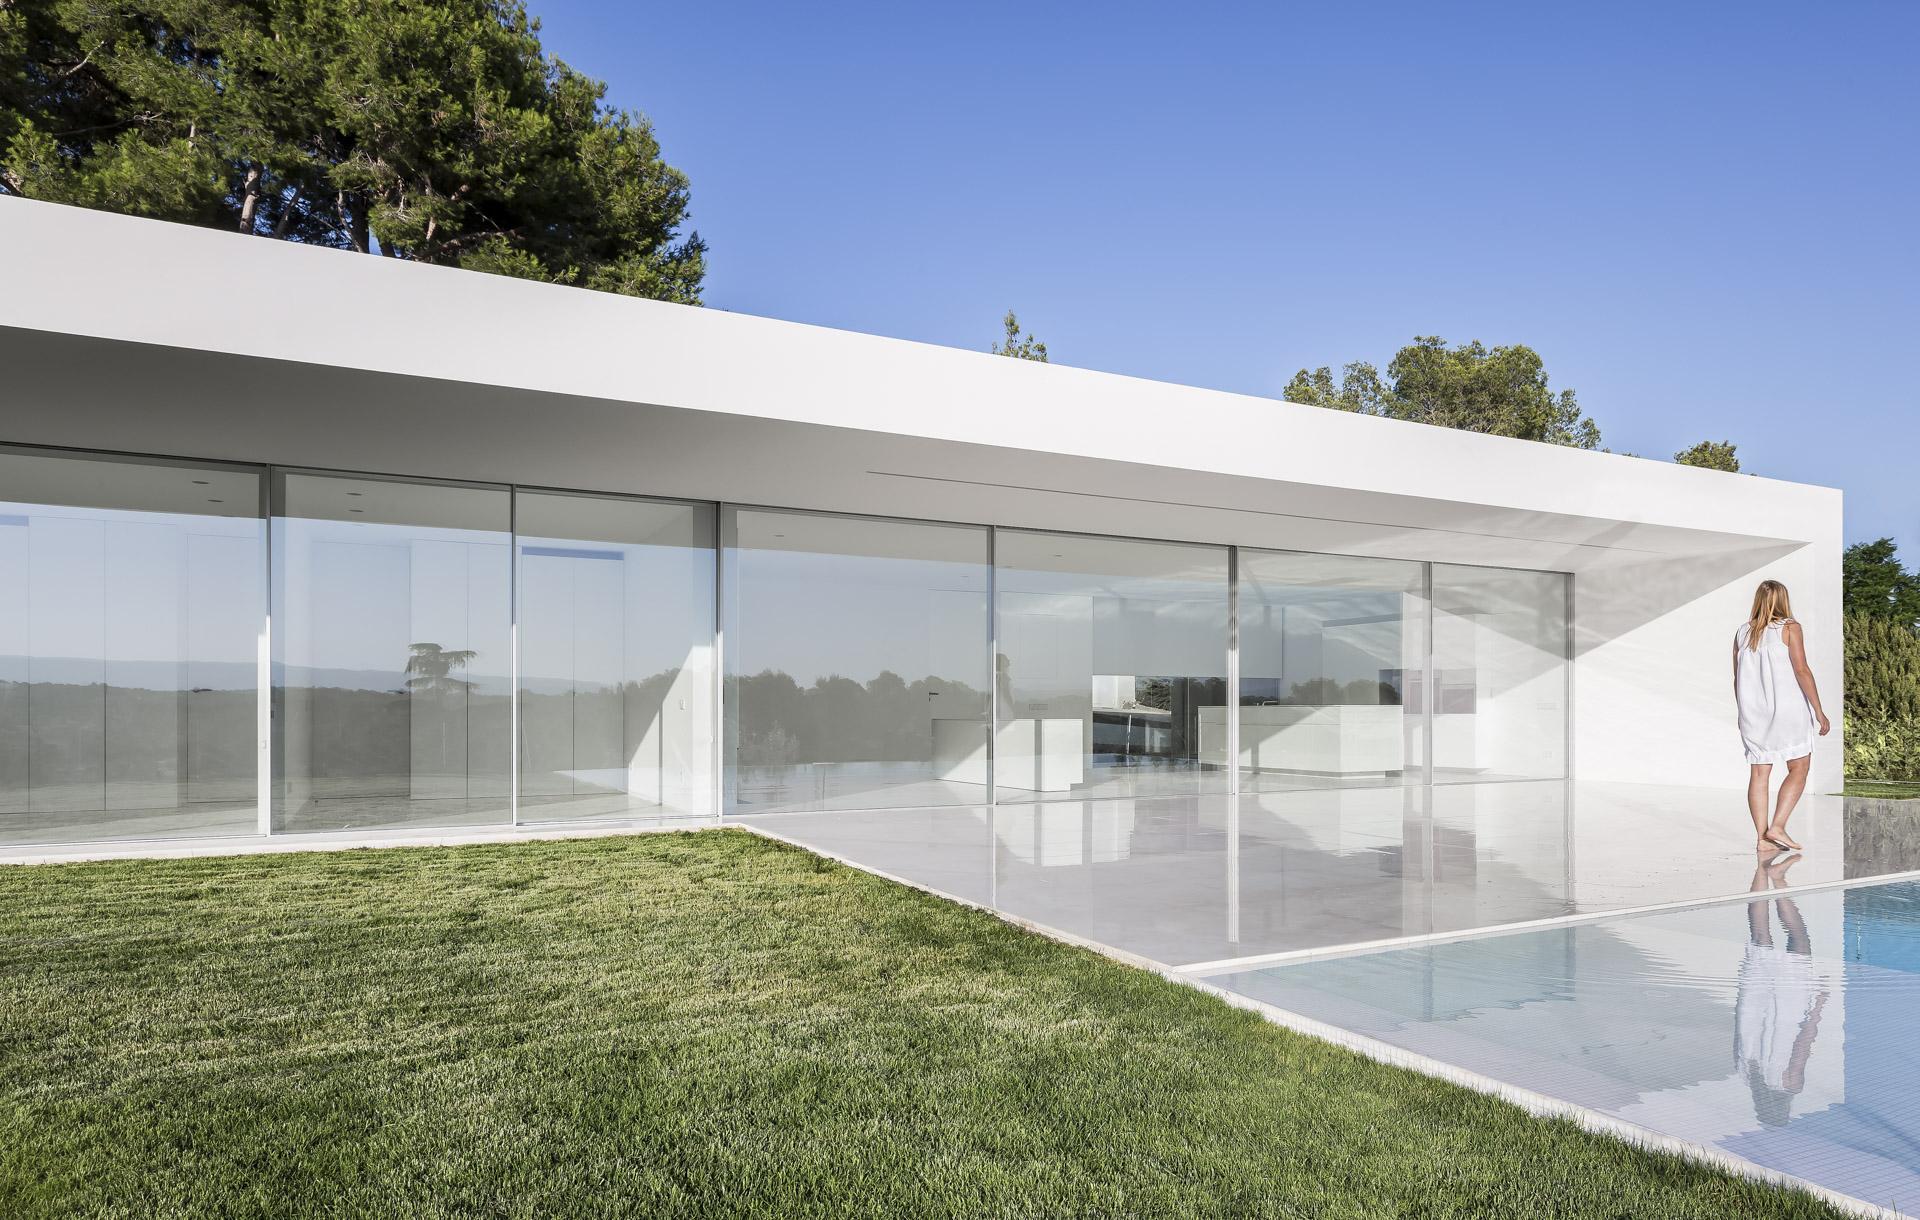 fotografia-arquitectura-valencia-german-cabo-gallardo-llopis-villamarchante-vivienda-36